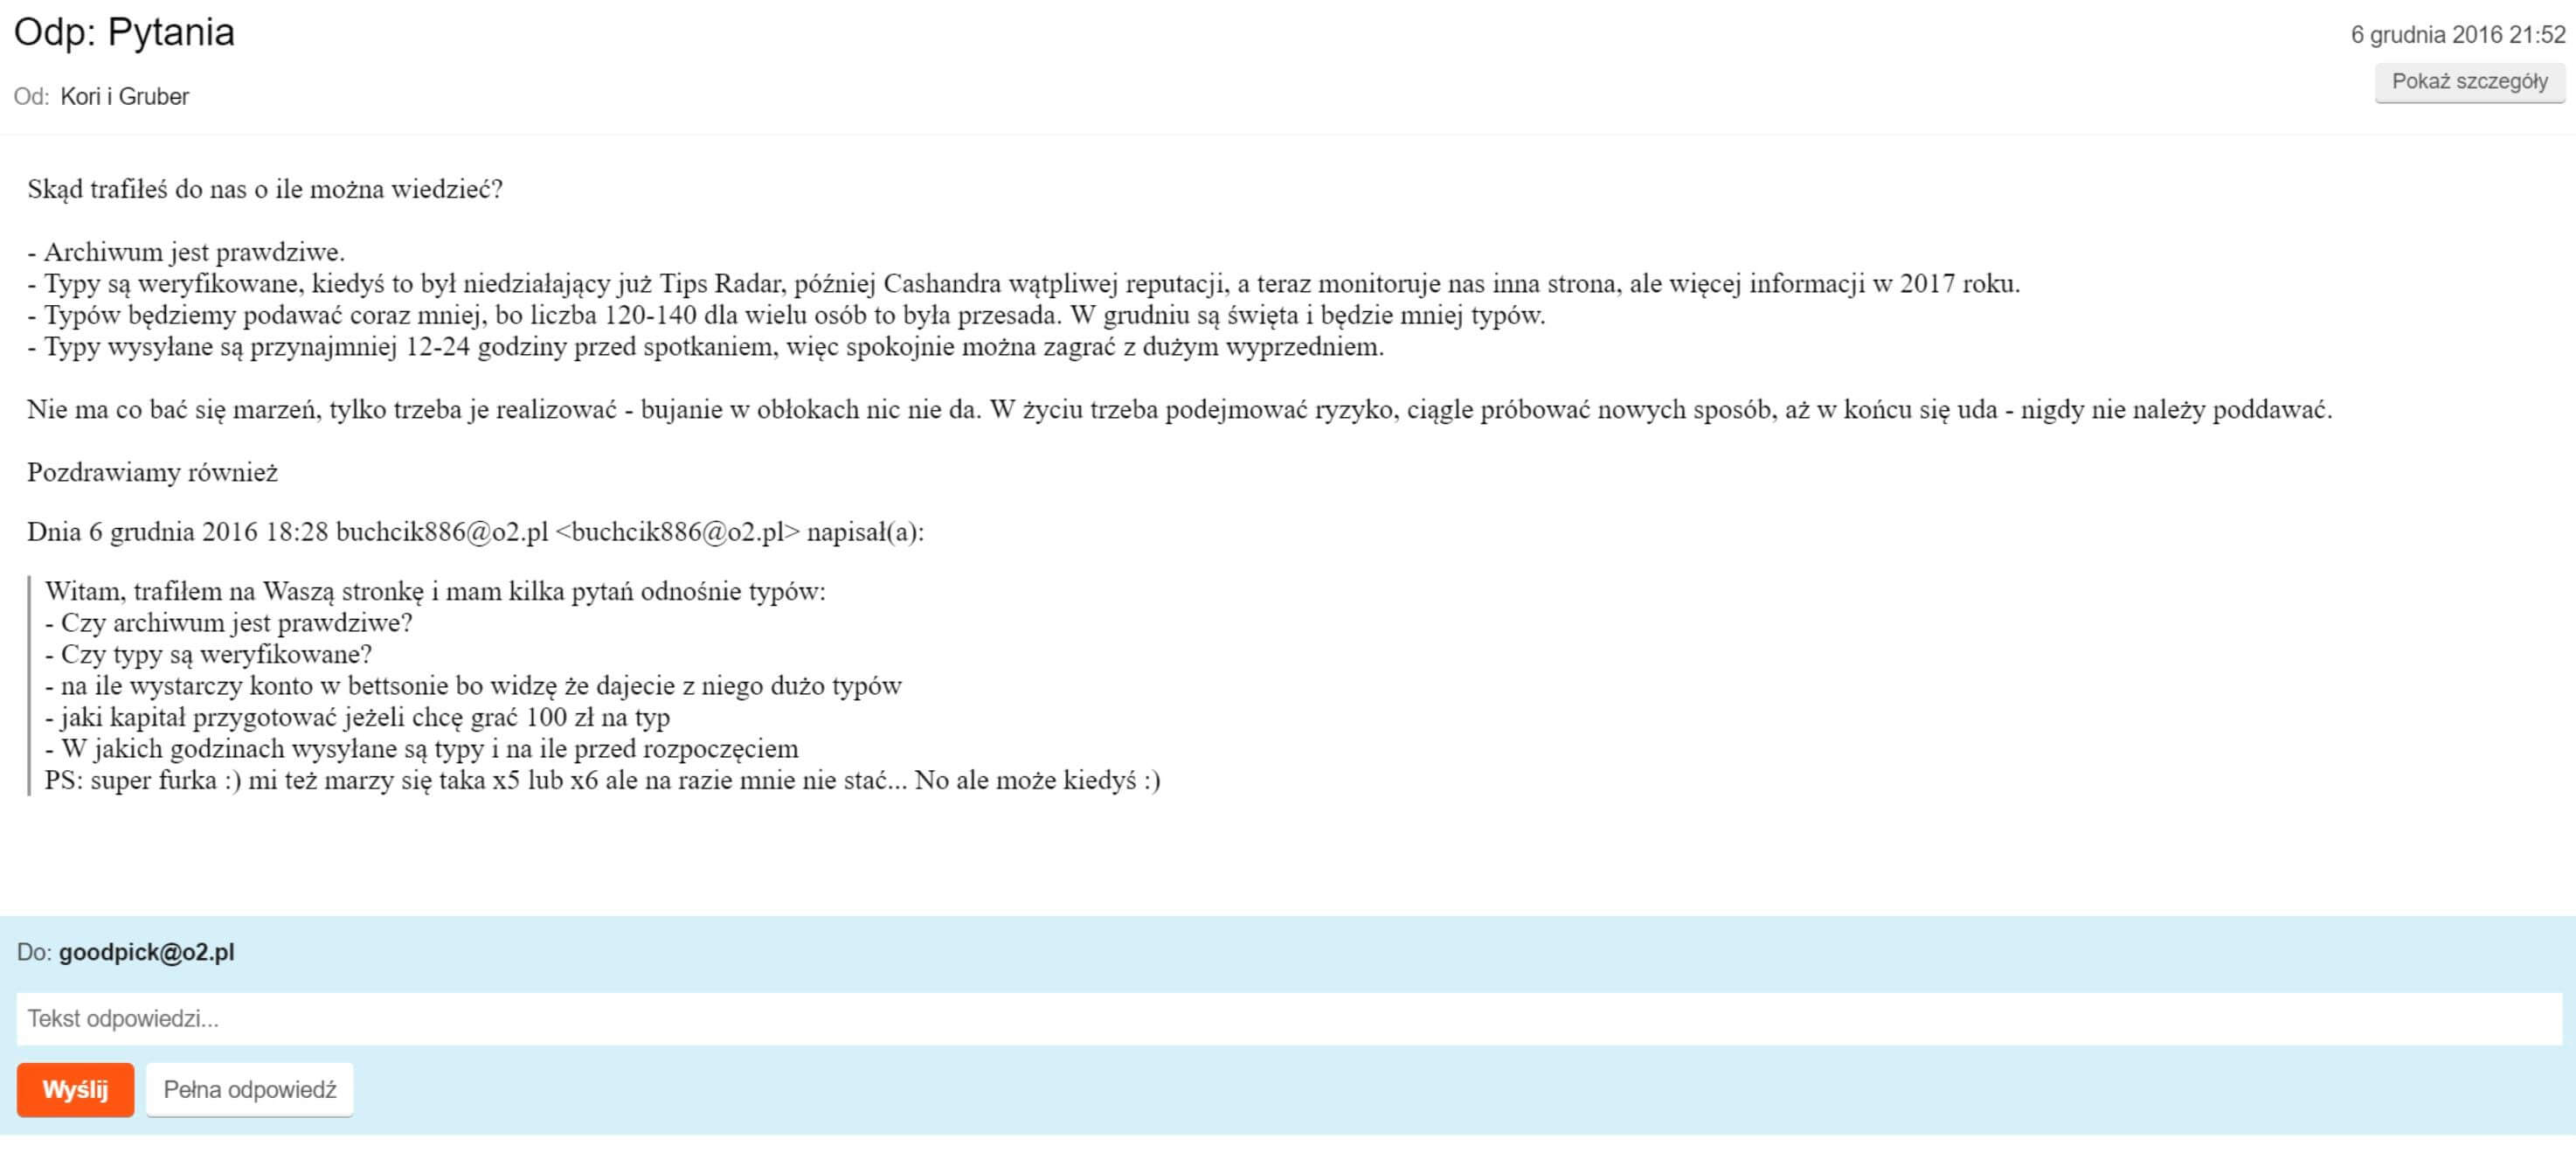 22-email-goodpick.jpg